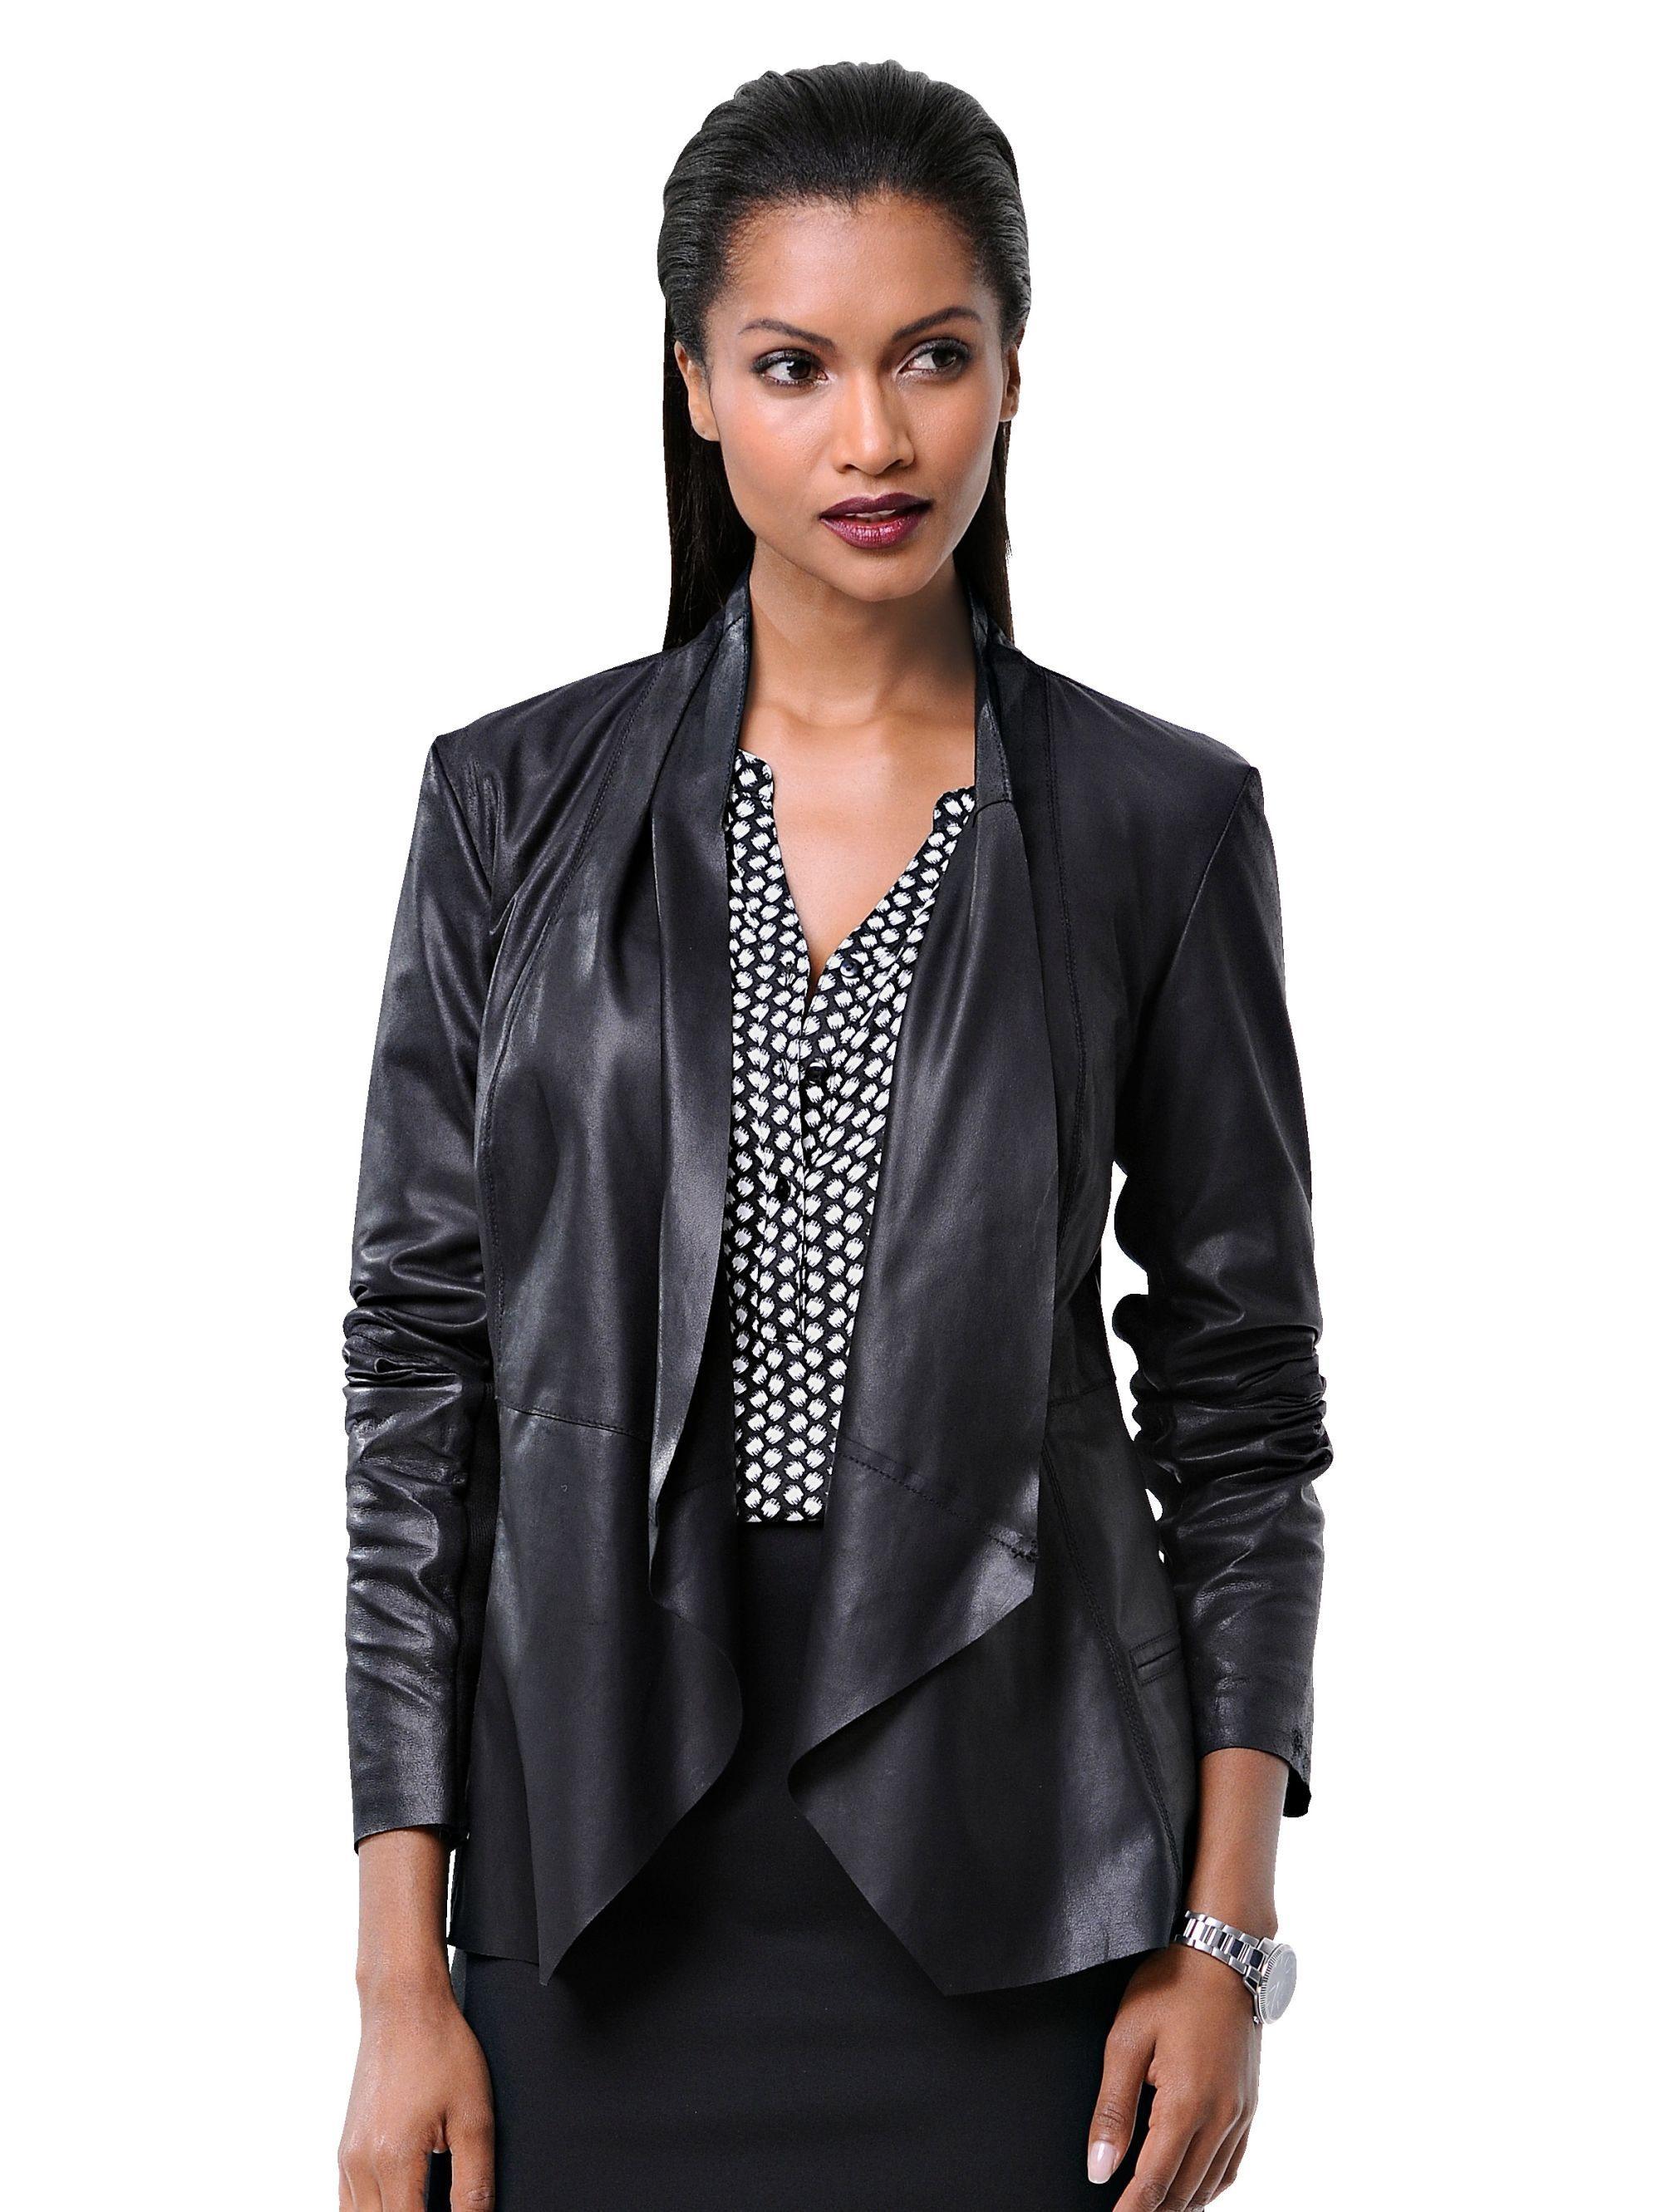 Alba Moda Lederjacke aus softem Ziegenveloursleder | Bekleidung > Jacken > Lederjacken & Kunstlederjacken | Schwarz | Jersey - Polyester - Baumwolle | Alba Moda